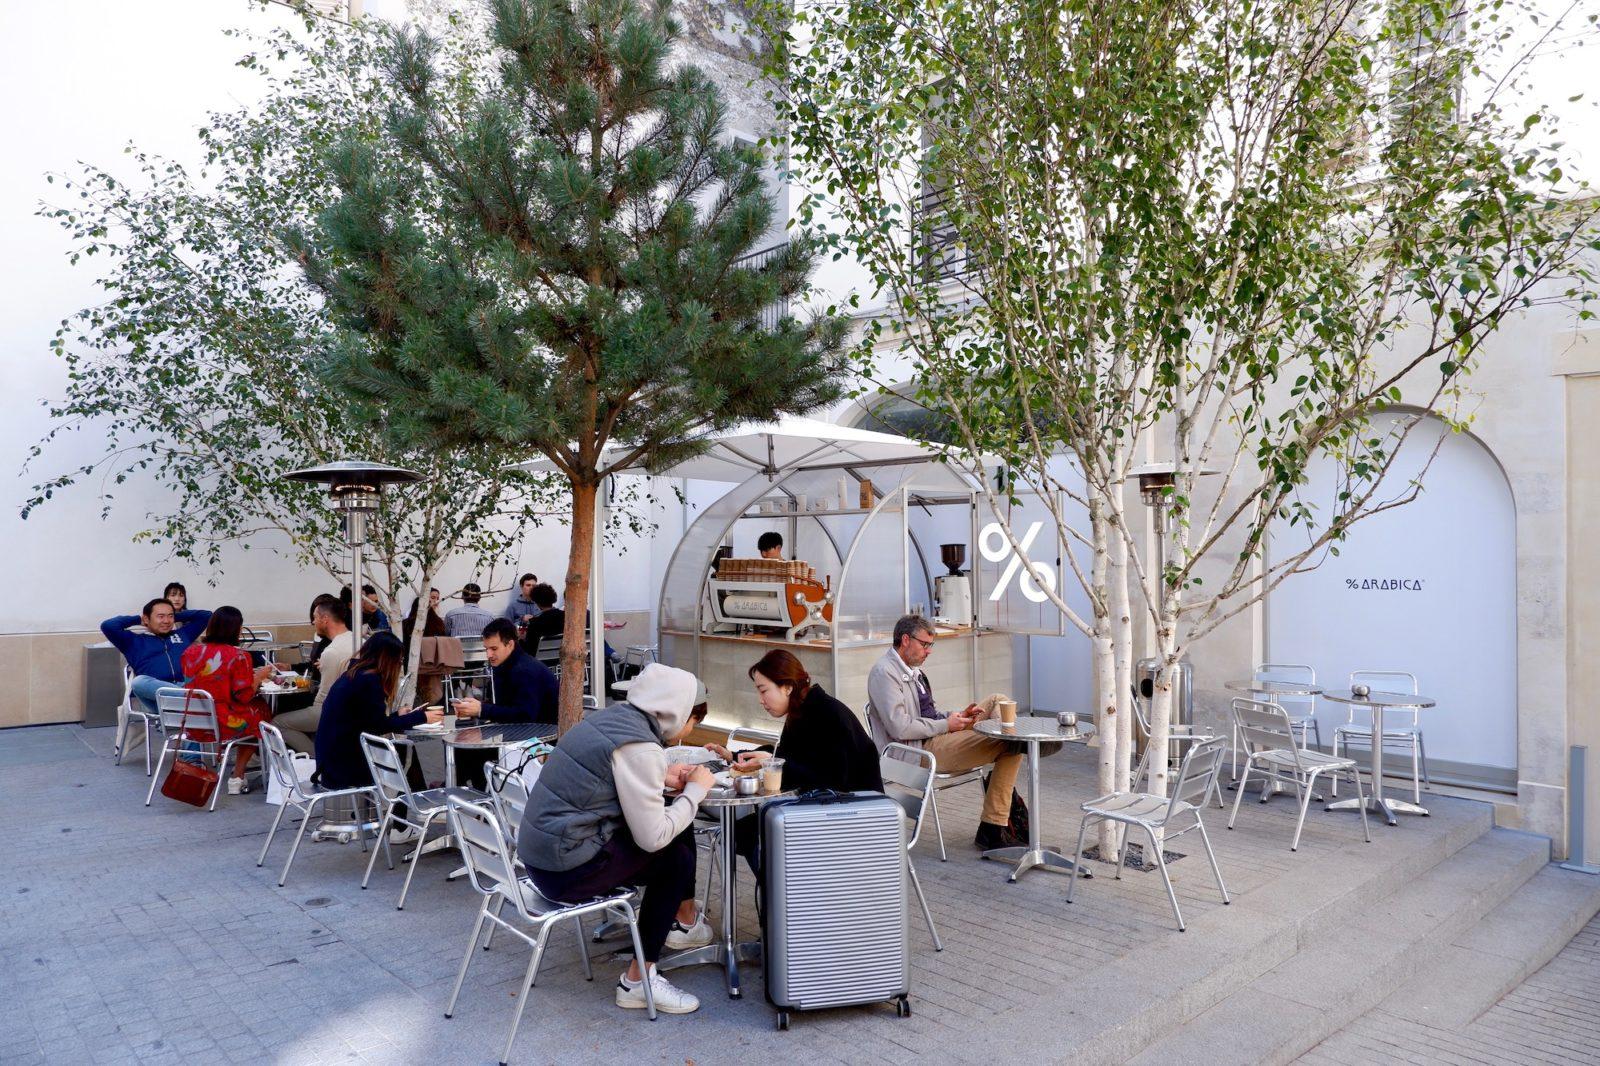 The outdoor cafe 100% Arabica at Beaupassage in Paris' St Germain Left Bank Neighborhood